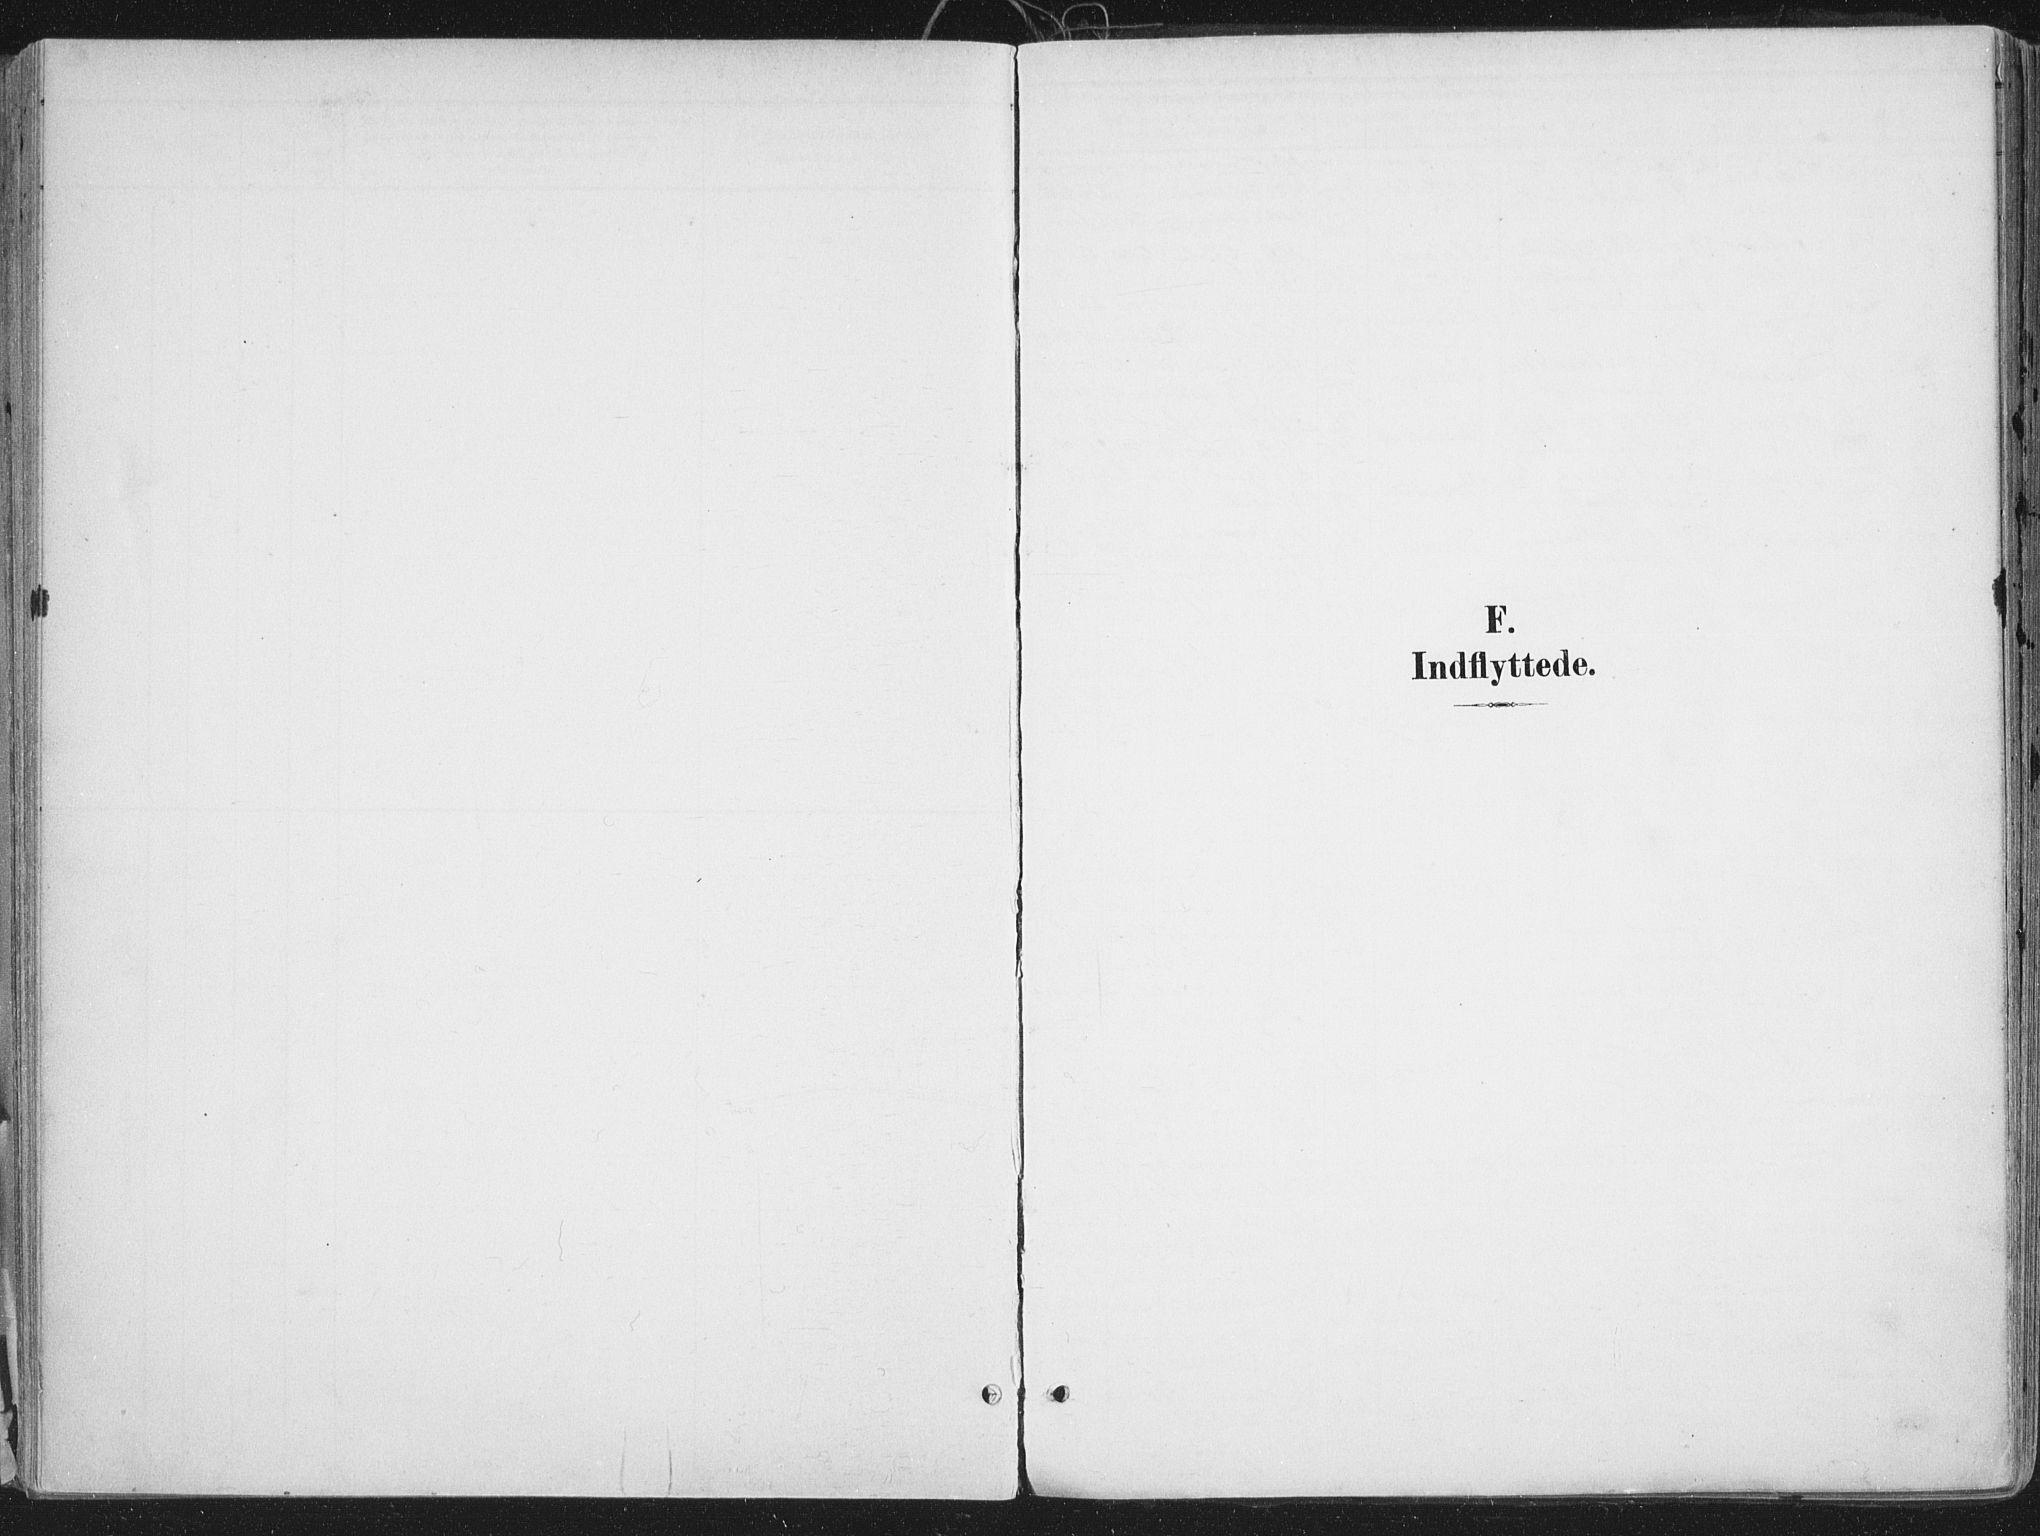 SATØ, Ibestad sokneprestembete, Ministerialbok nr. 17, 1901-1914